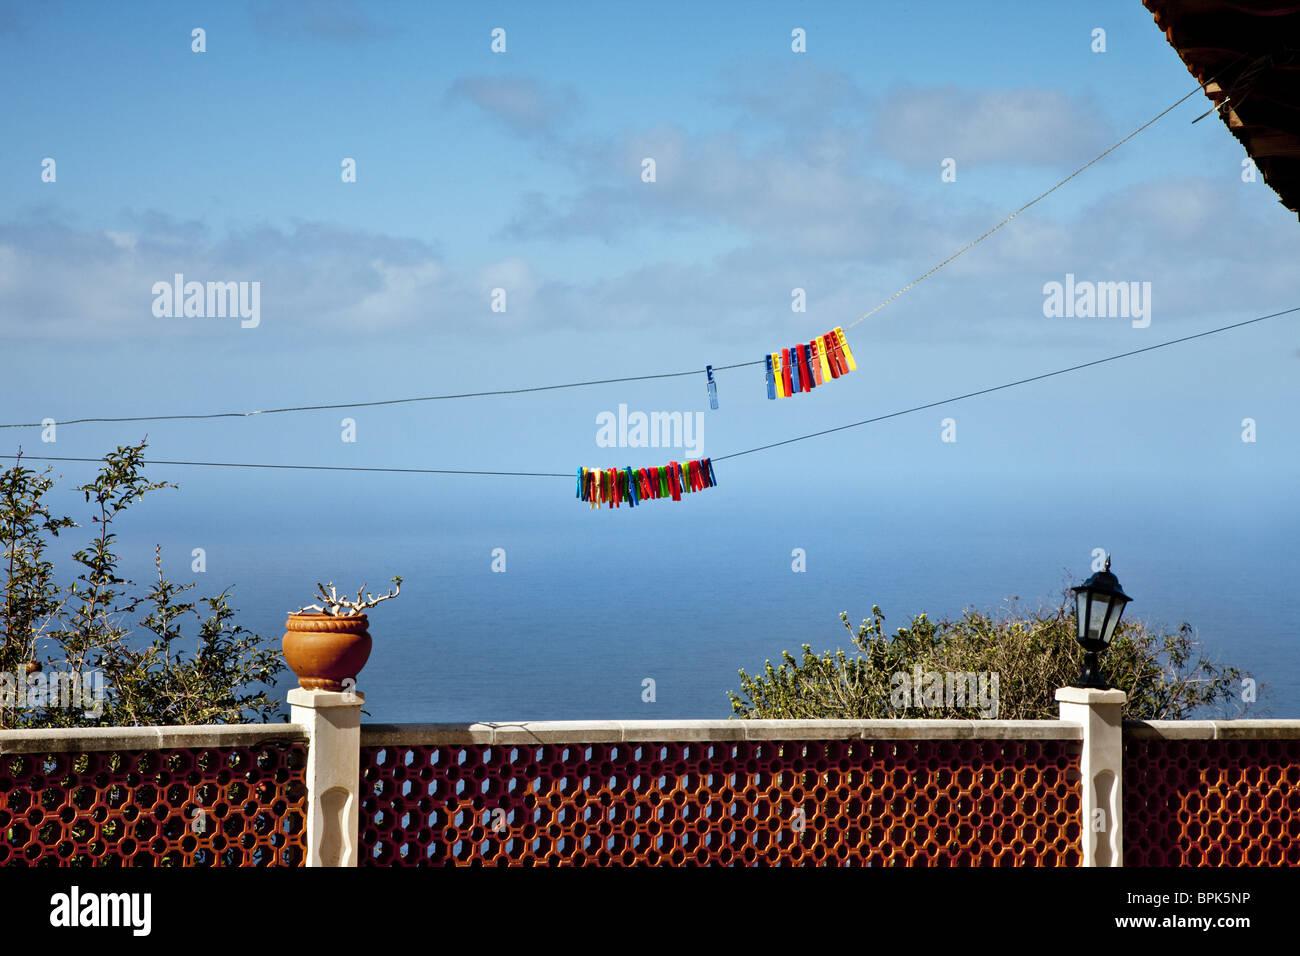 Seaview and clothesline, La Palma, Canary Islands, Spain, Europe - Stock Image